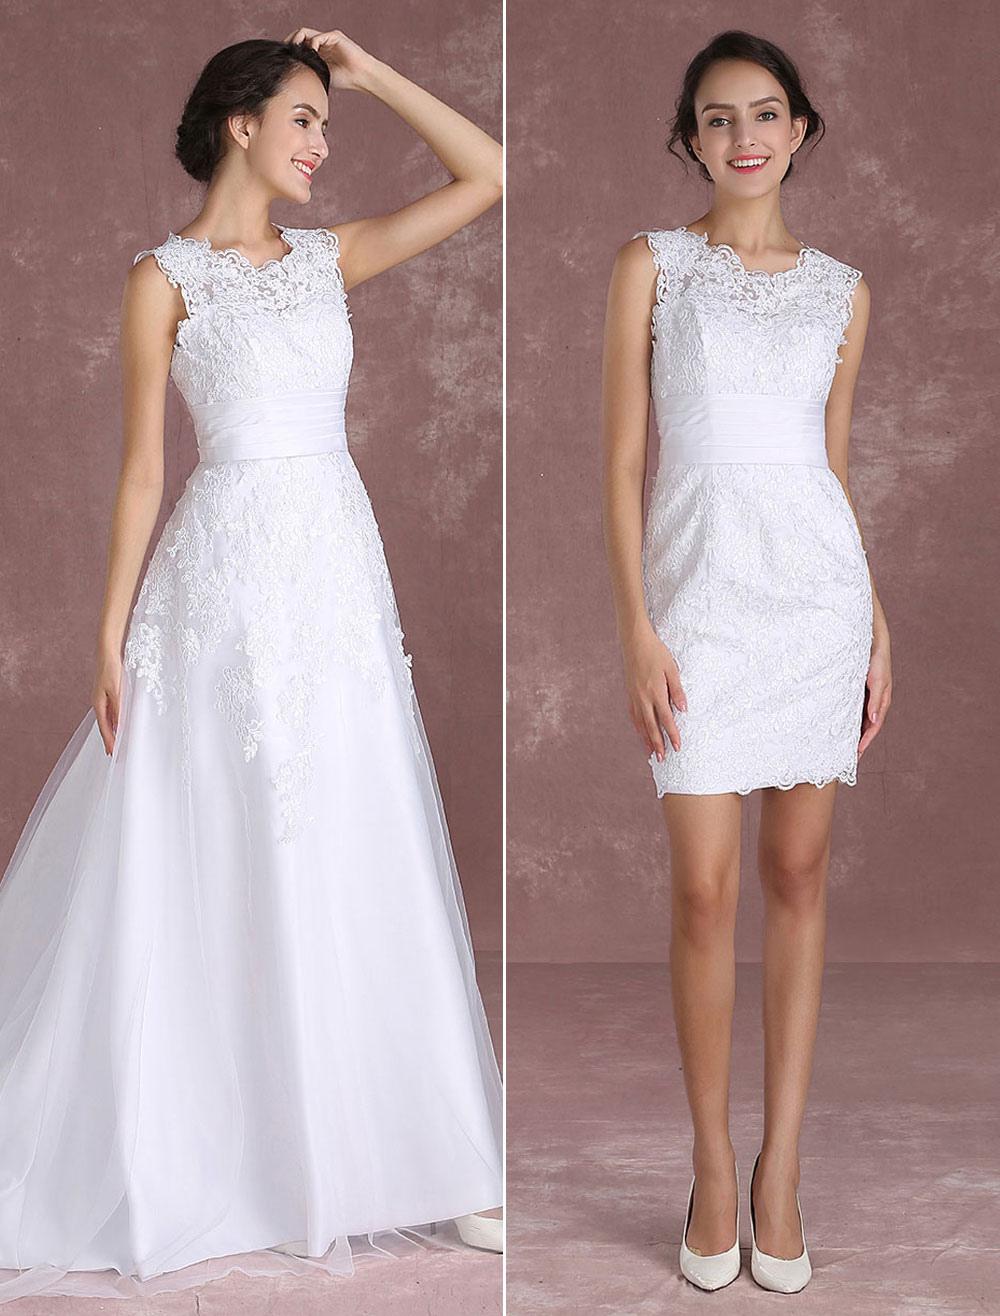 Buy White Wedding Dresses Lace Applique Sleeveless Bridal Gown Detachable Train Satin Sash Bridal Dress for $123.49 in Milanoo store